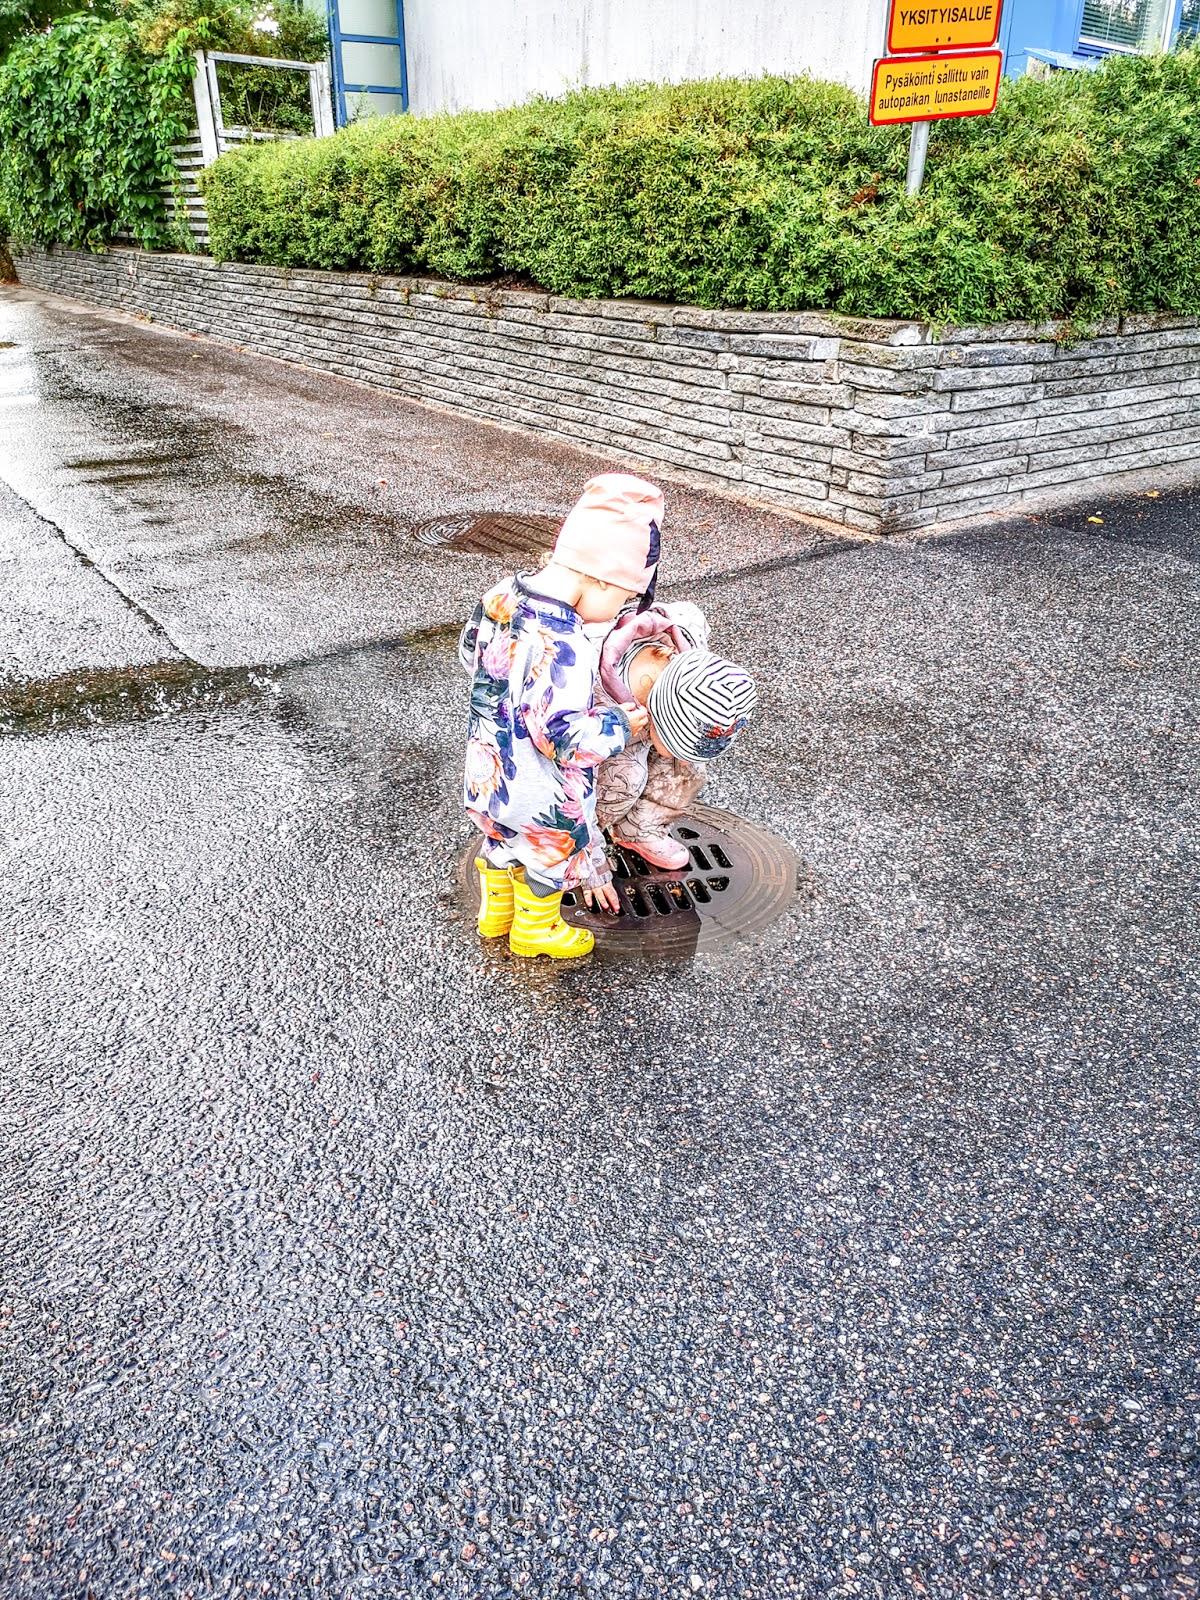 Big mamas home by Jenni S. 2019 luetuimmat postaukset